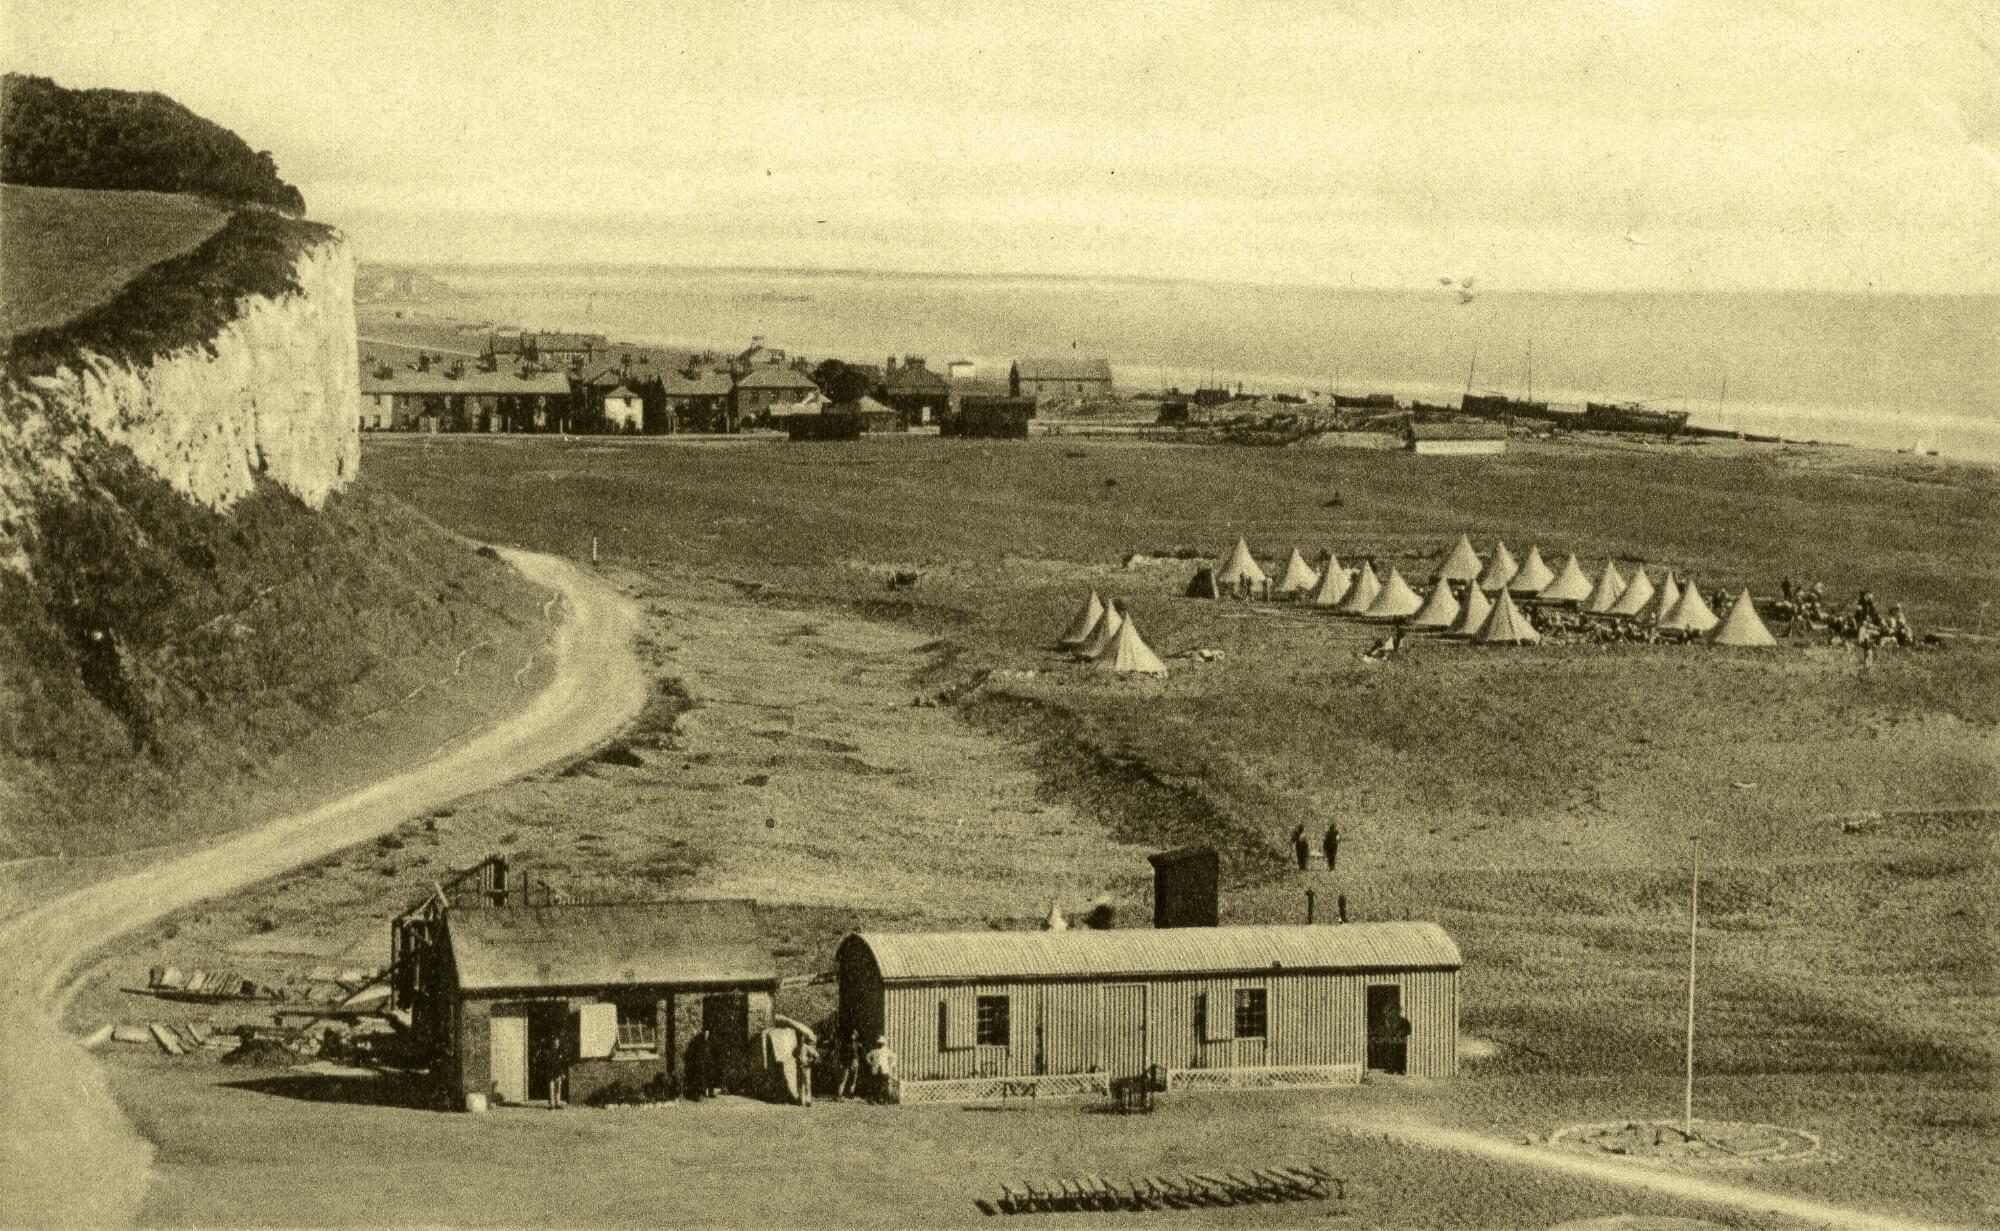 Kingsdown Rifle Range and Camp c1910